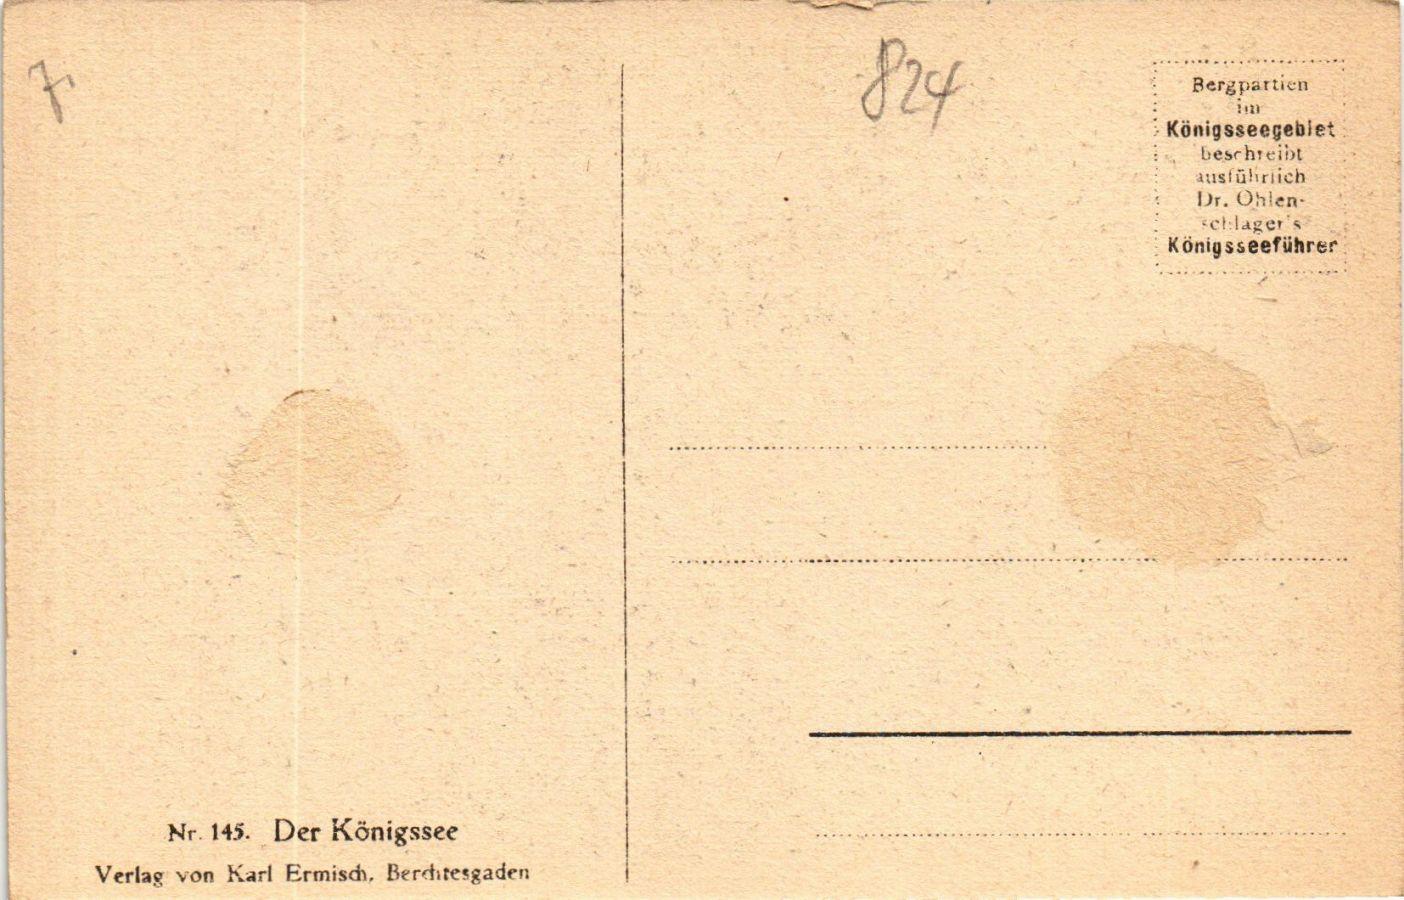 CPA-AK-Der-Konigssee-GERMANY-879331 miniature 2